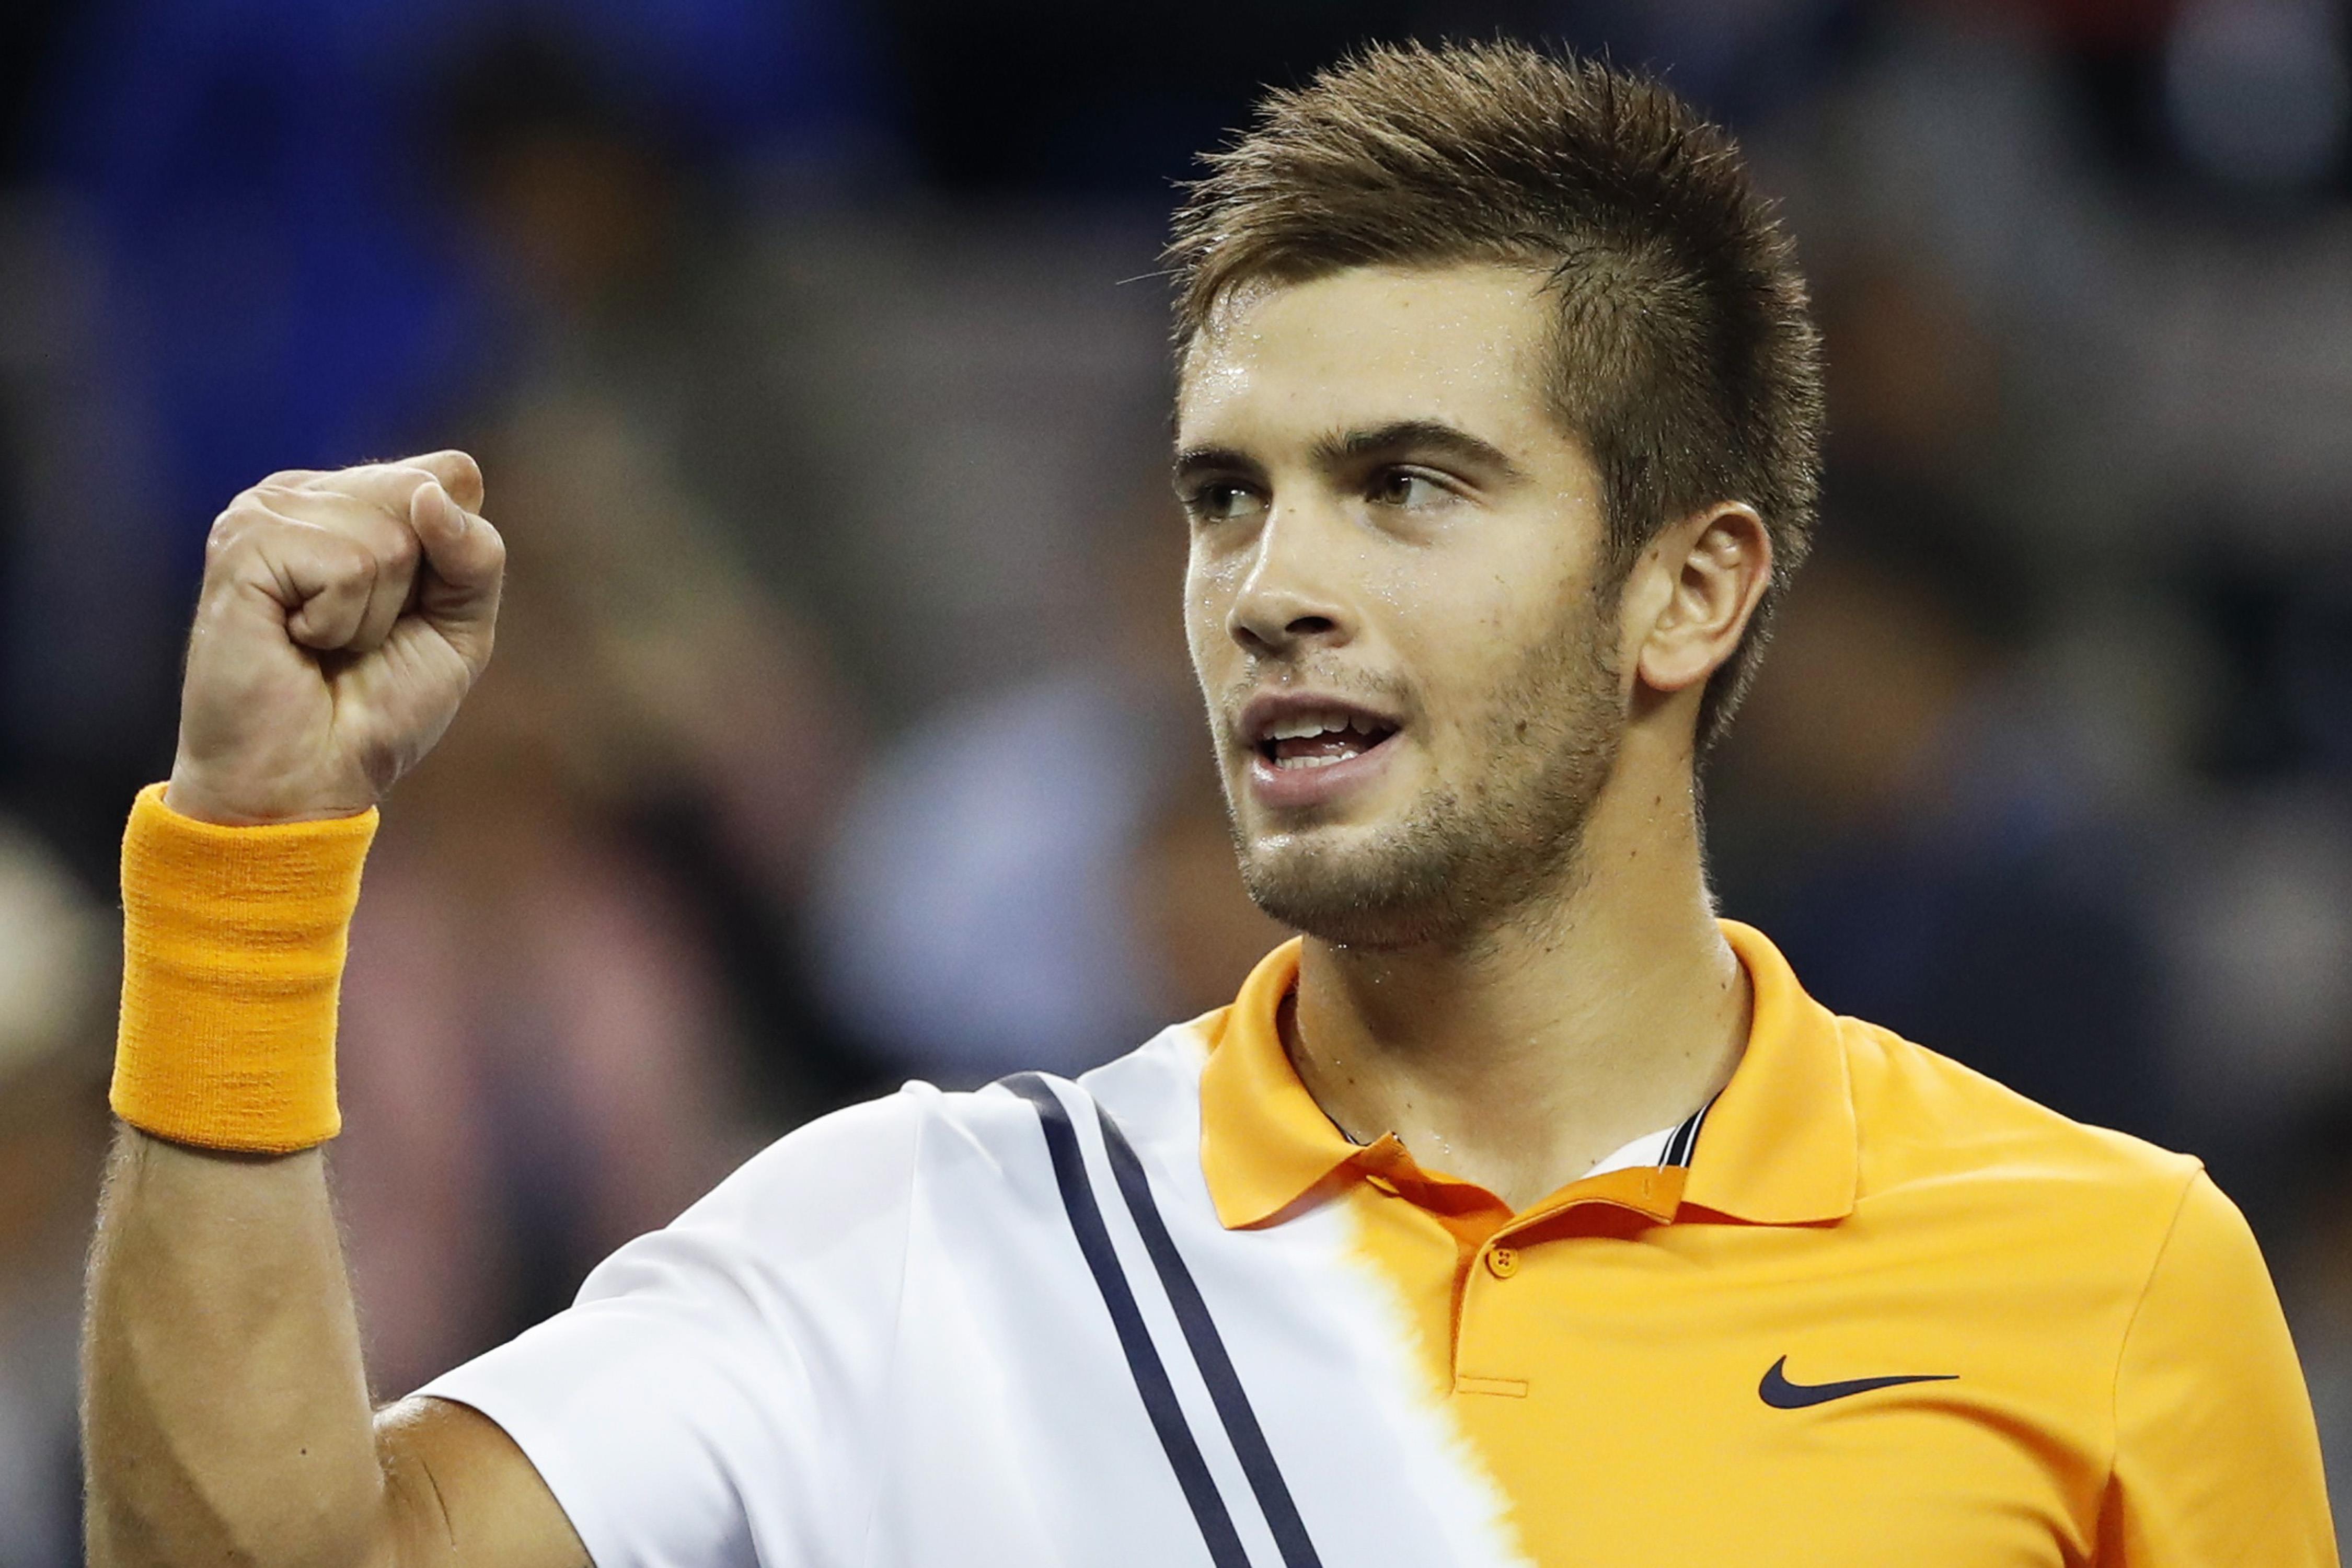 Tennis: Coric stuns Federer in Shanghai, faces Djokovic in final